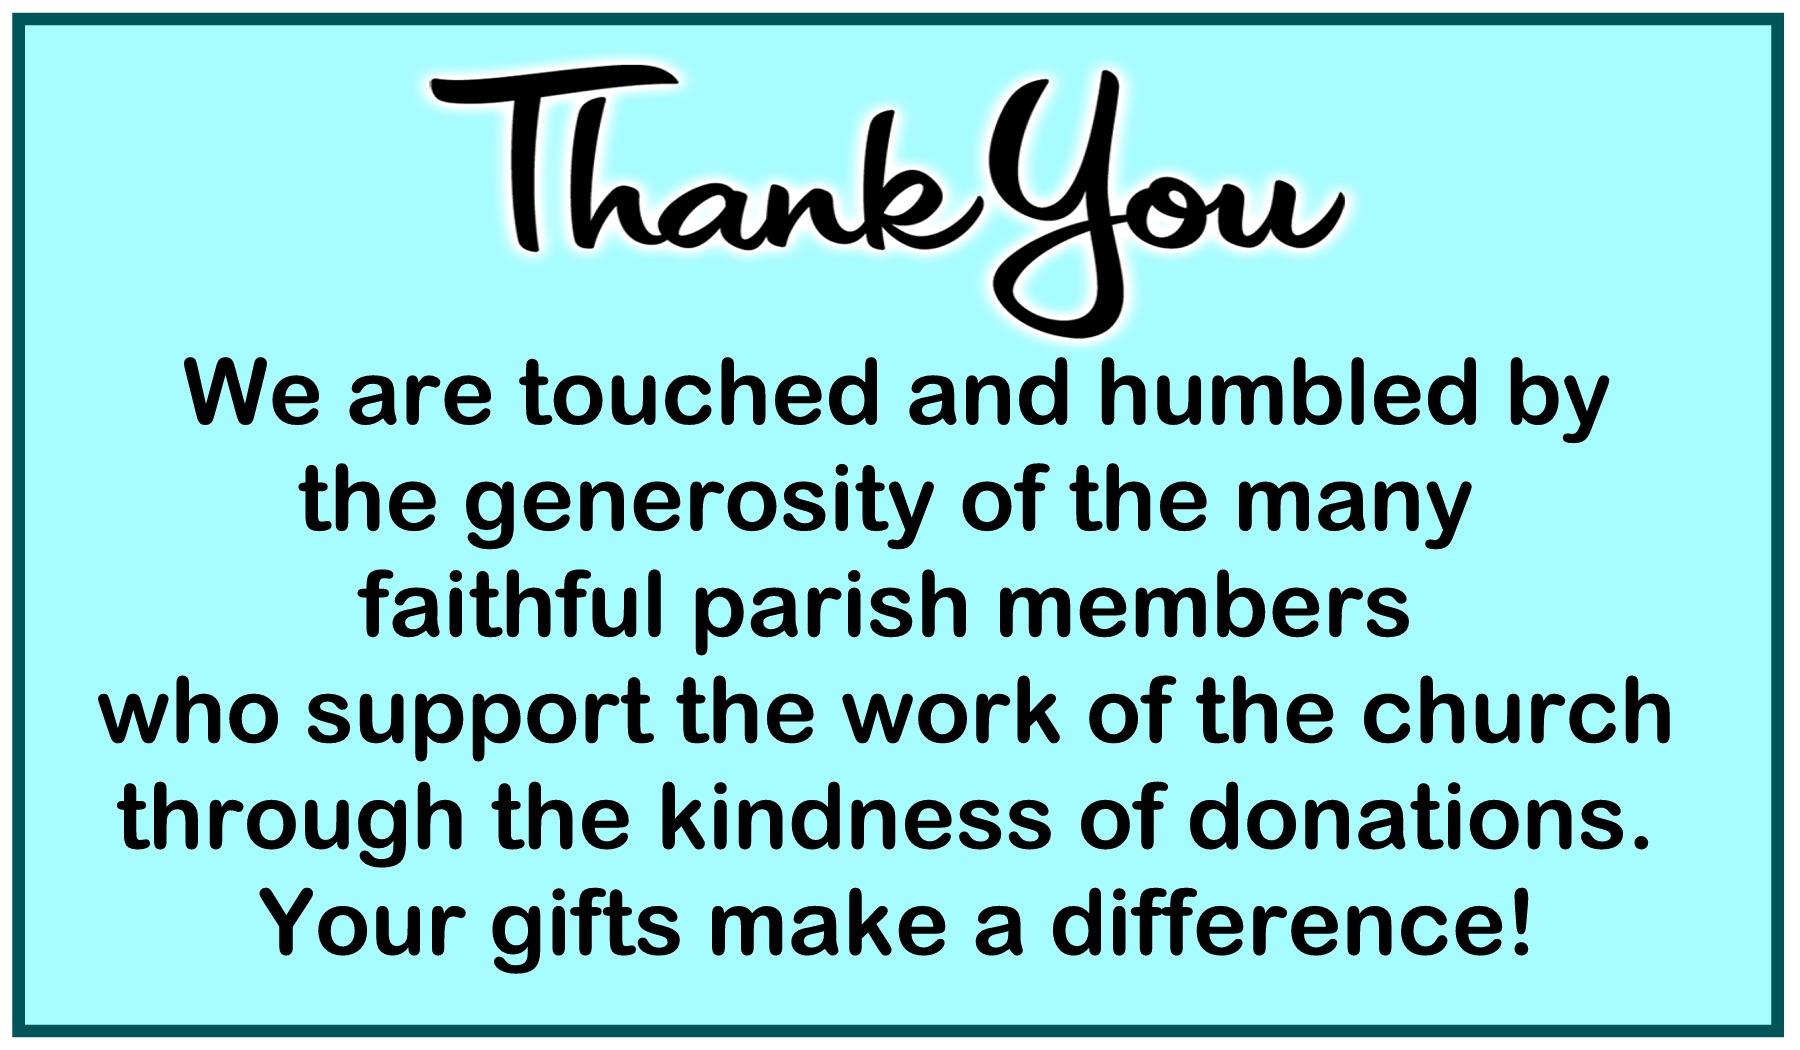 Thank you to Parishioners